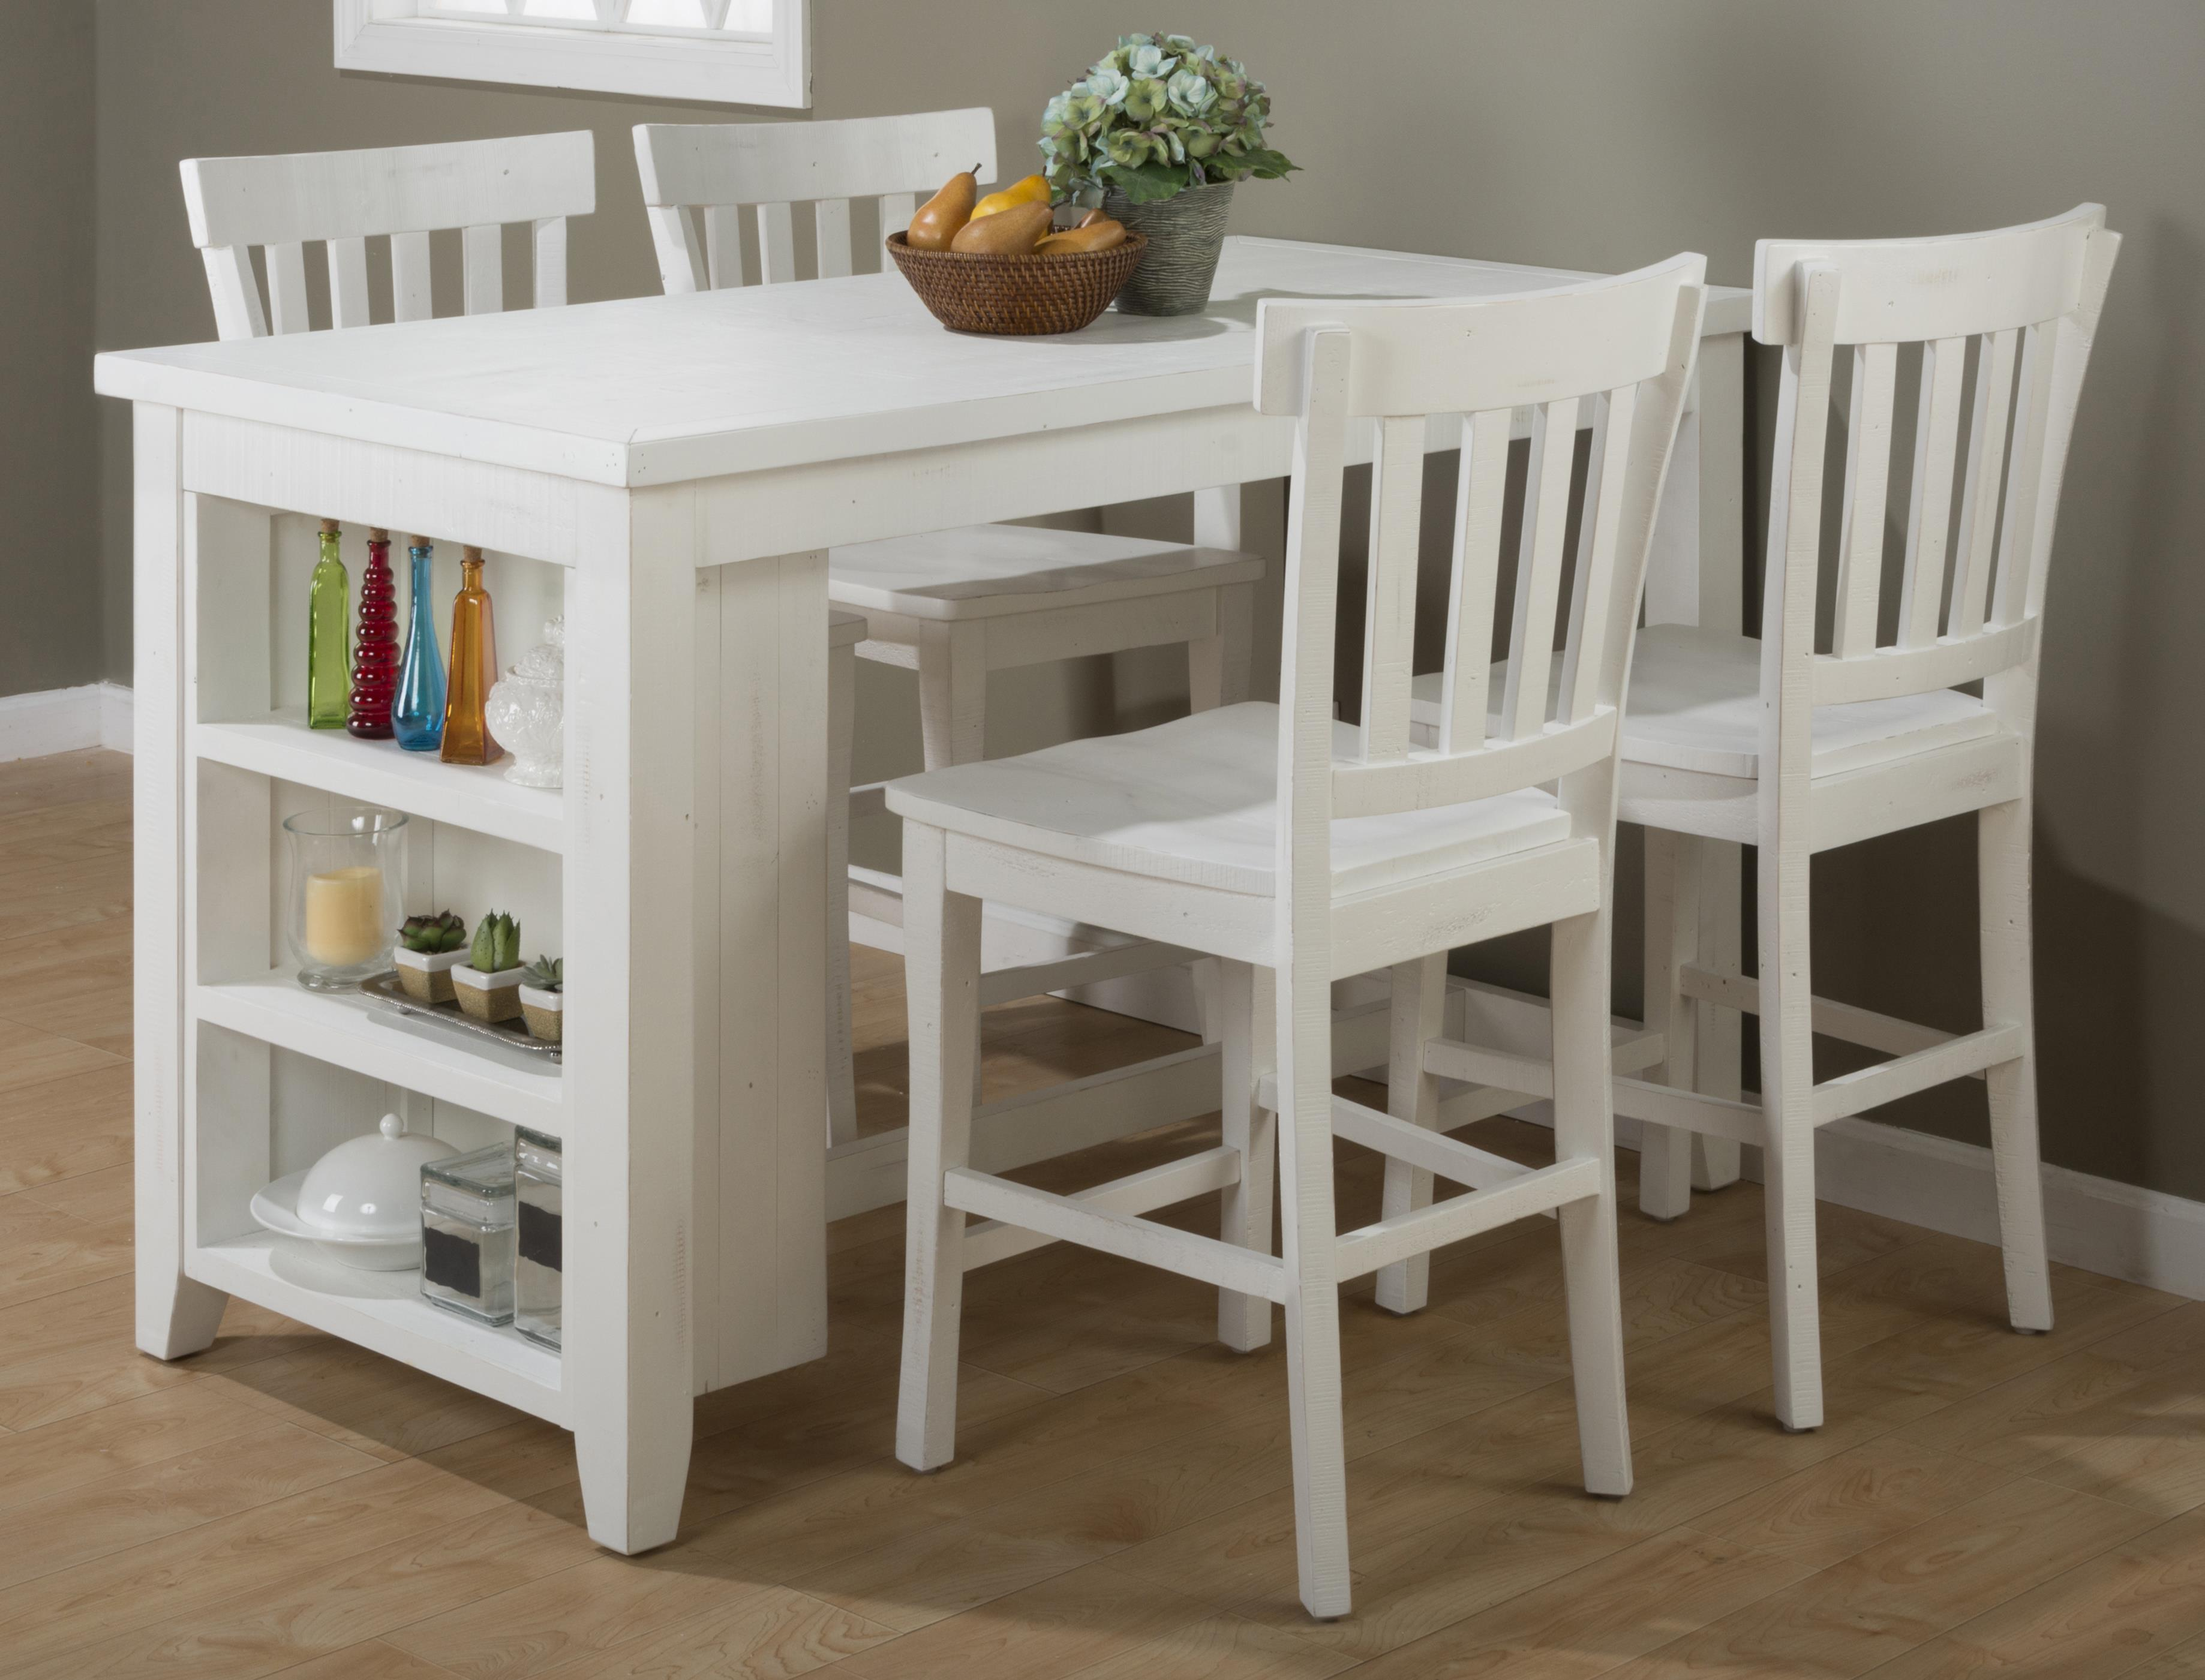 Madaket Reclaimed Pine Counter Height Table Set by Belfort Essentials at Belfort Furniture